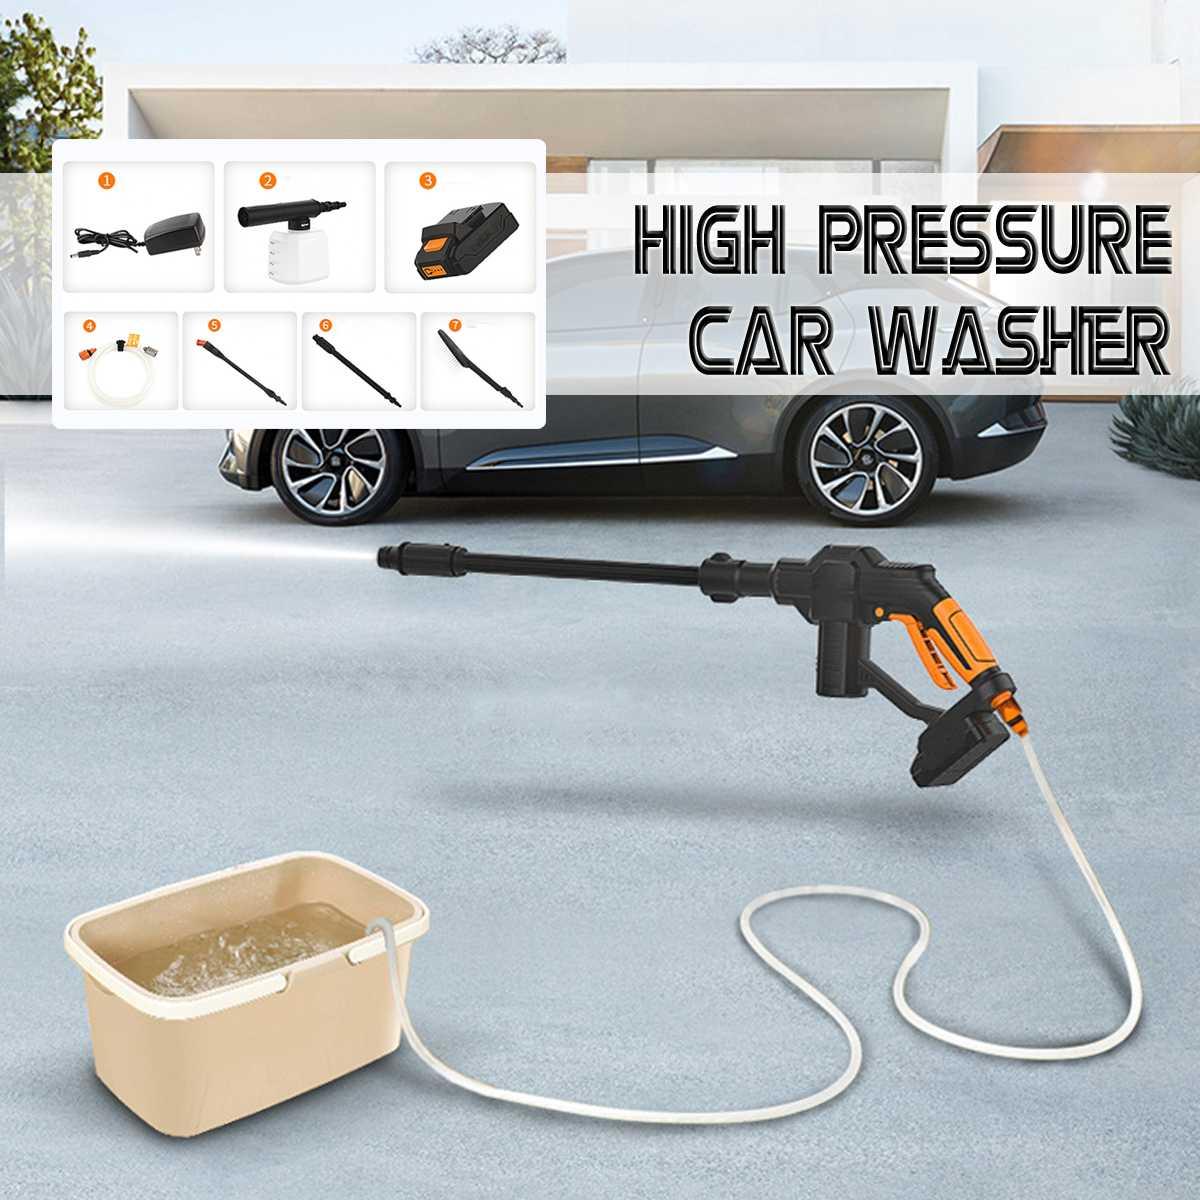 High Pressure Wireless Car Washer Cordless Water For Gun Sprayer Mufti-Functional Foam For Garden Watering Car Wash